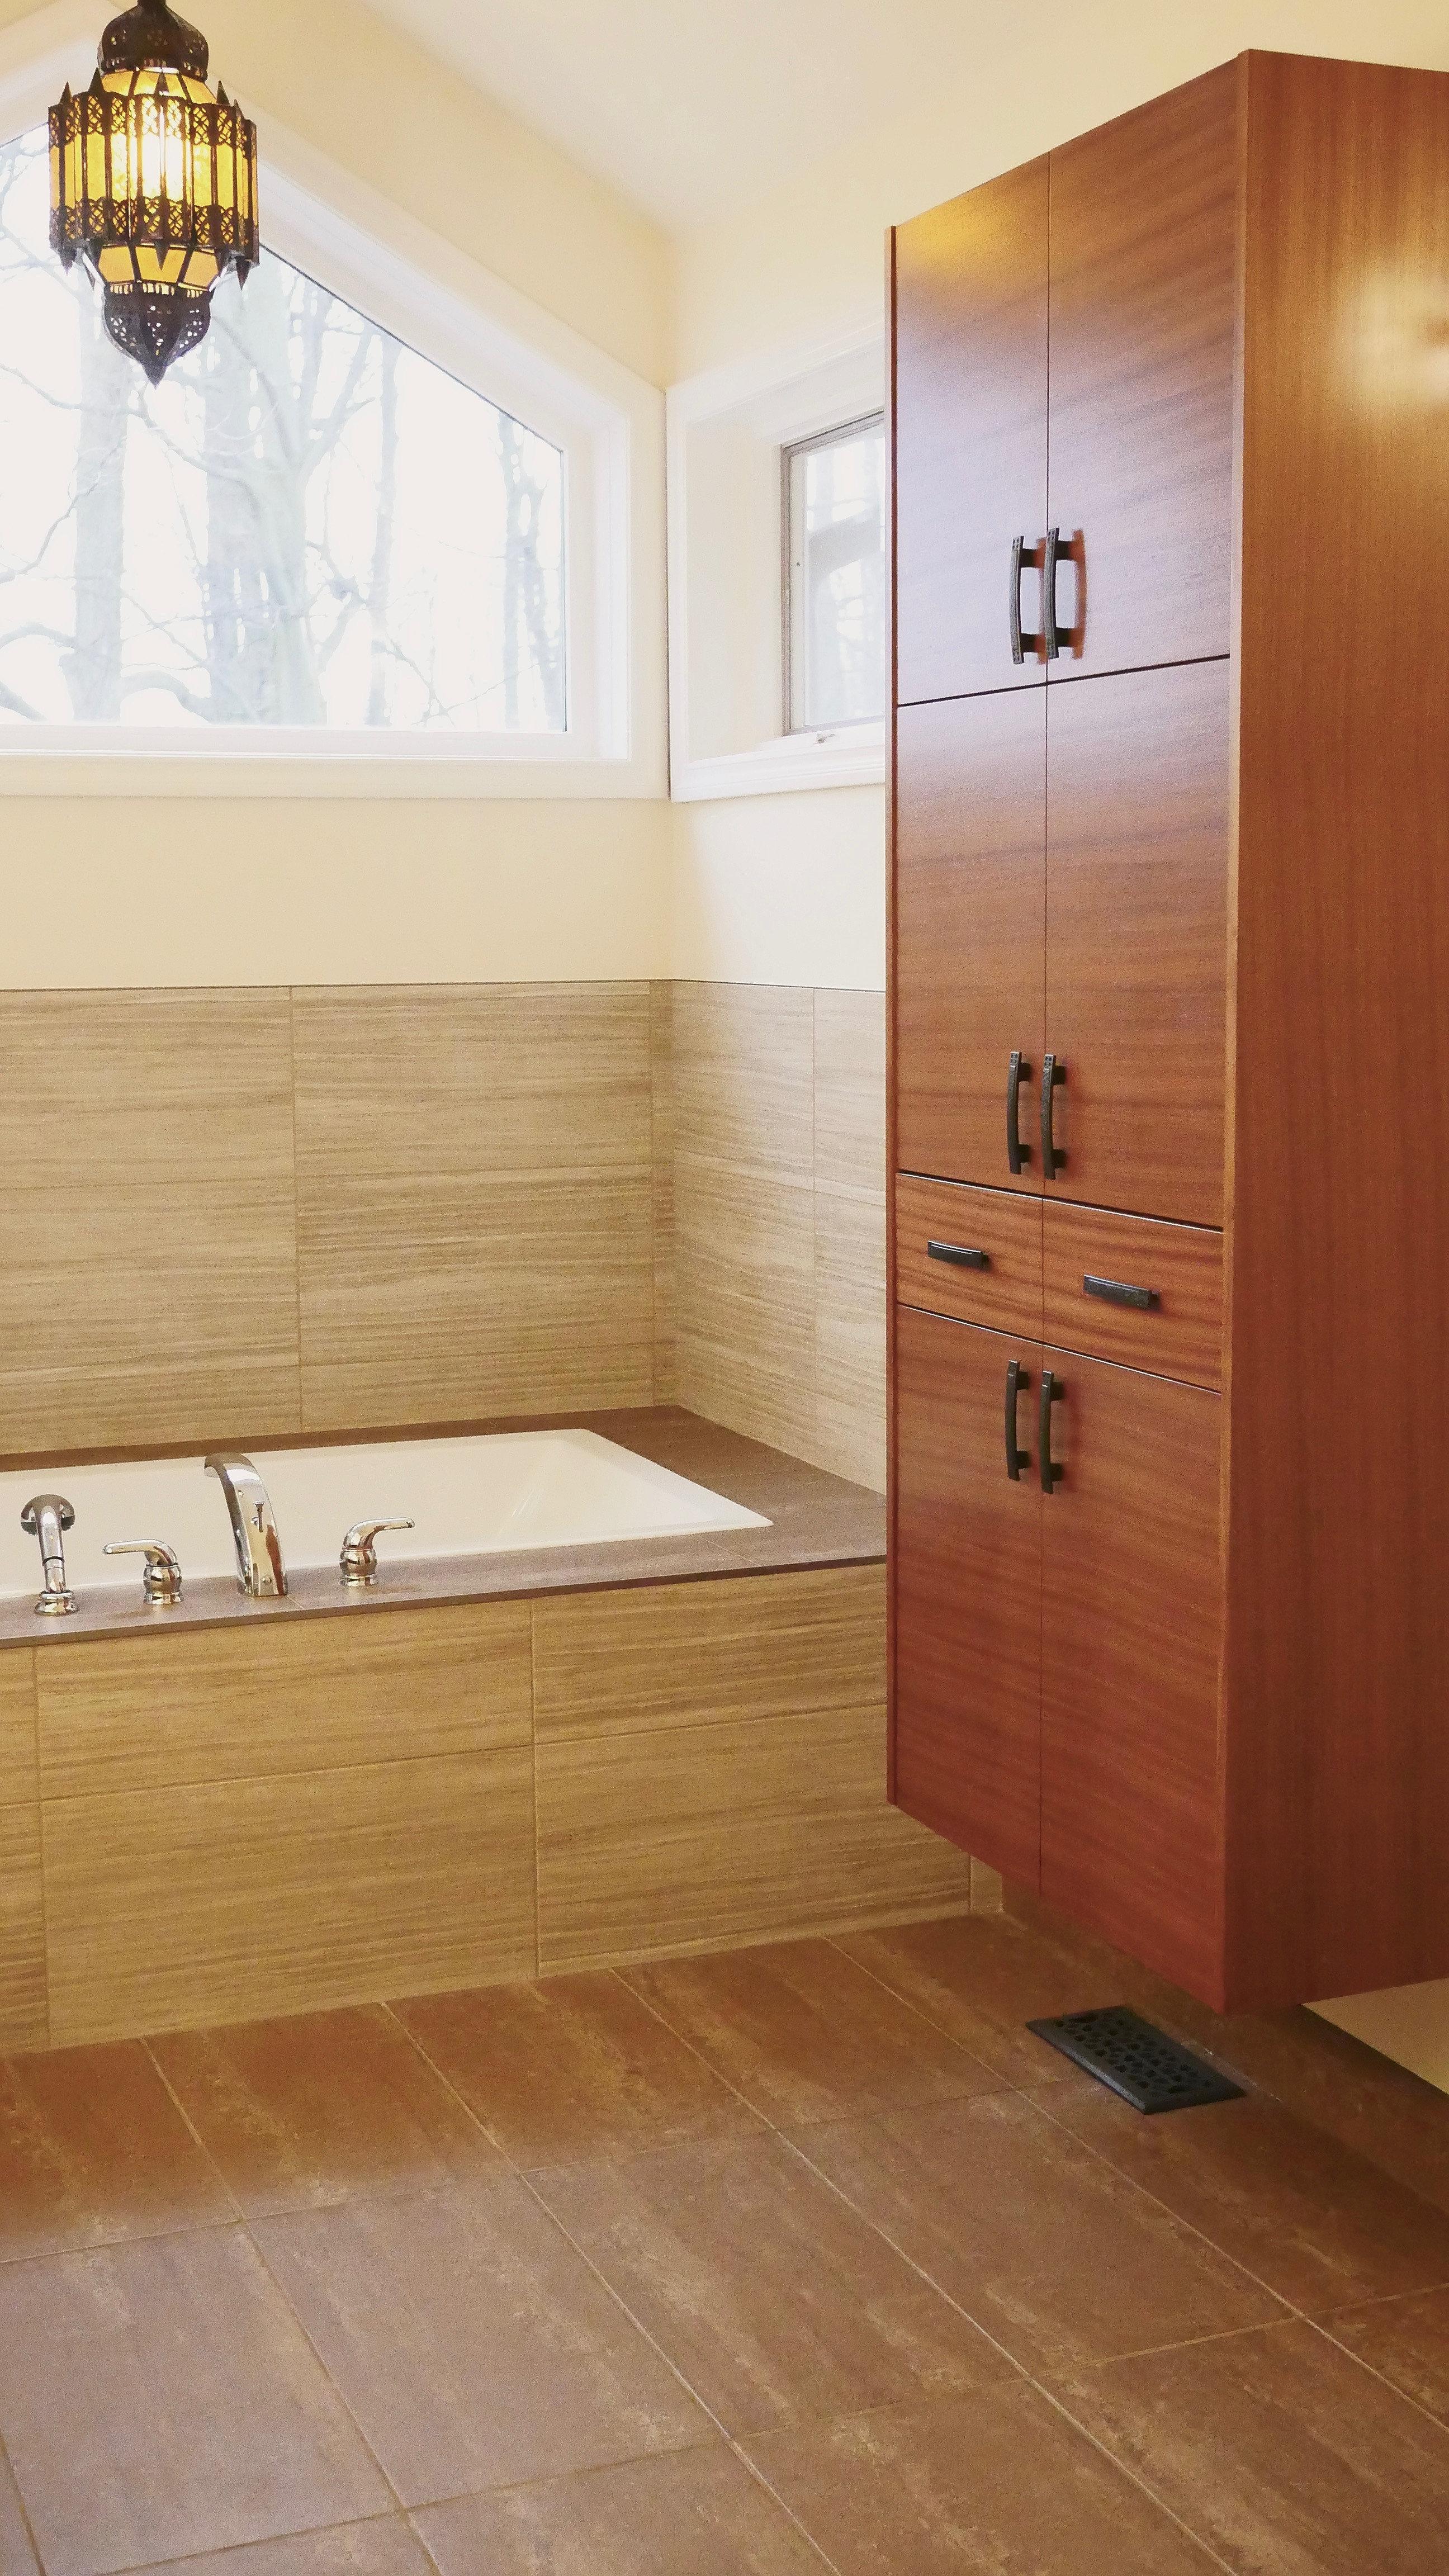 Final Touch Renos Full Bathroom Renovation